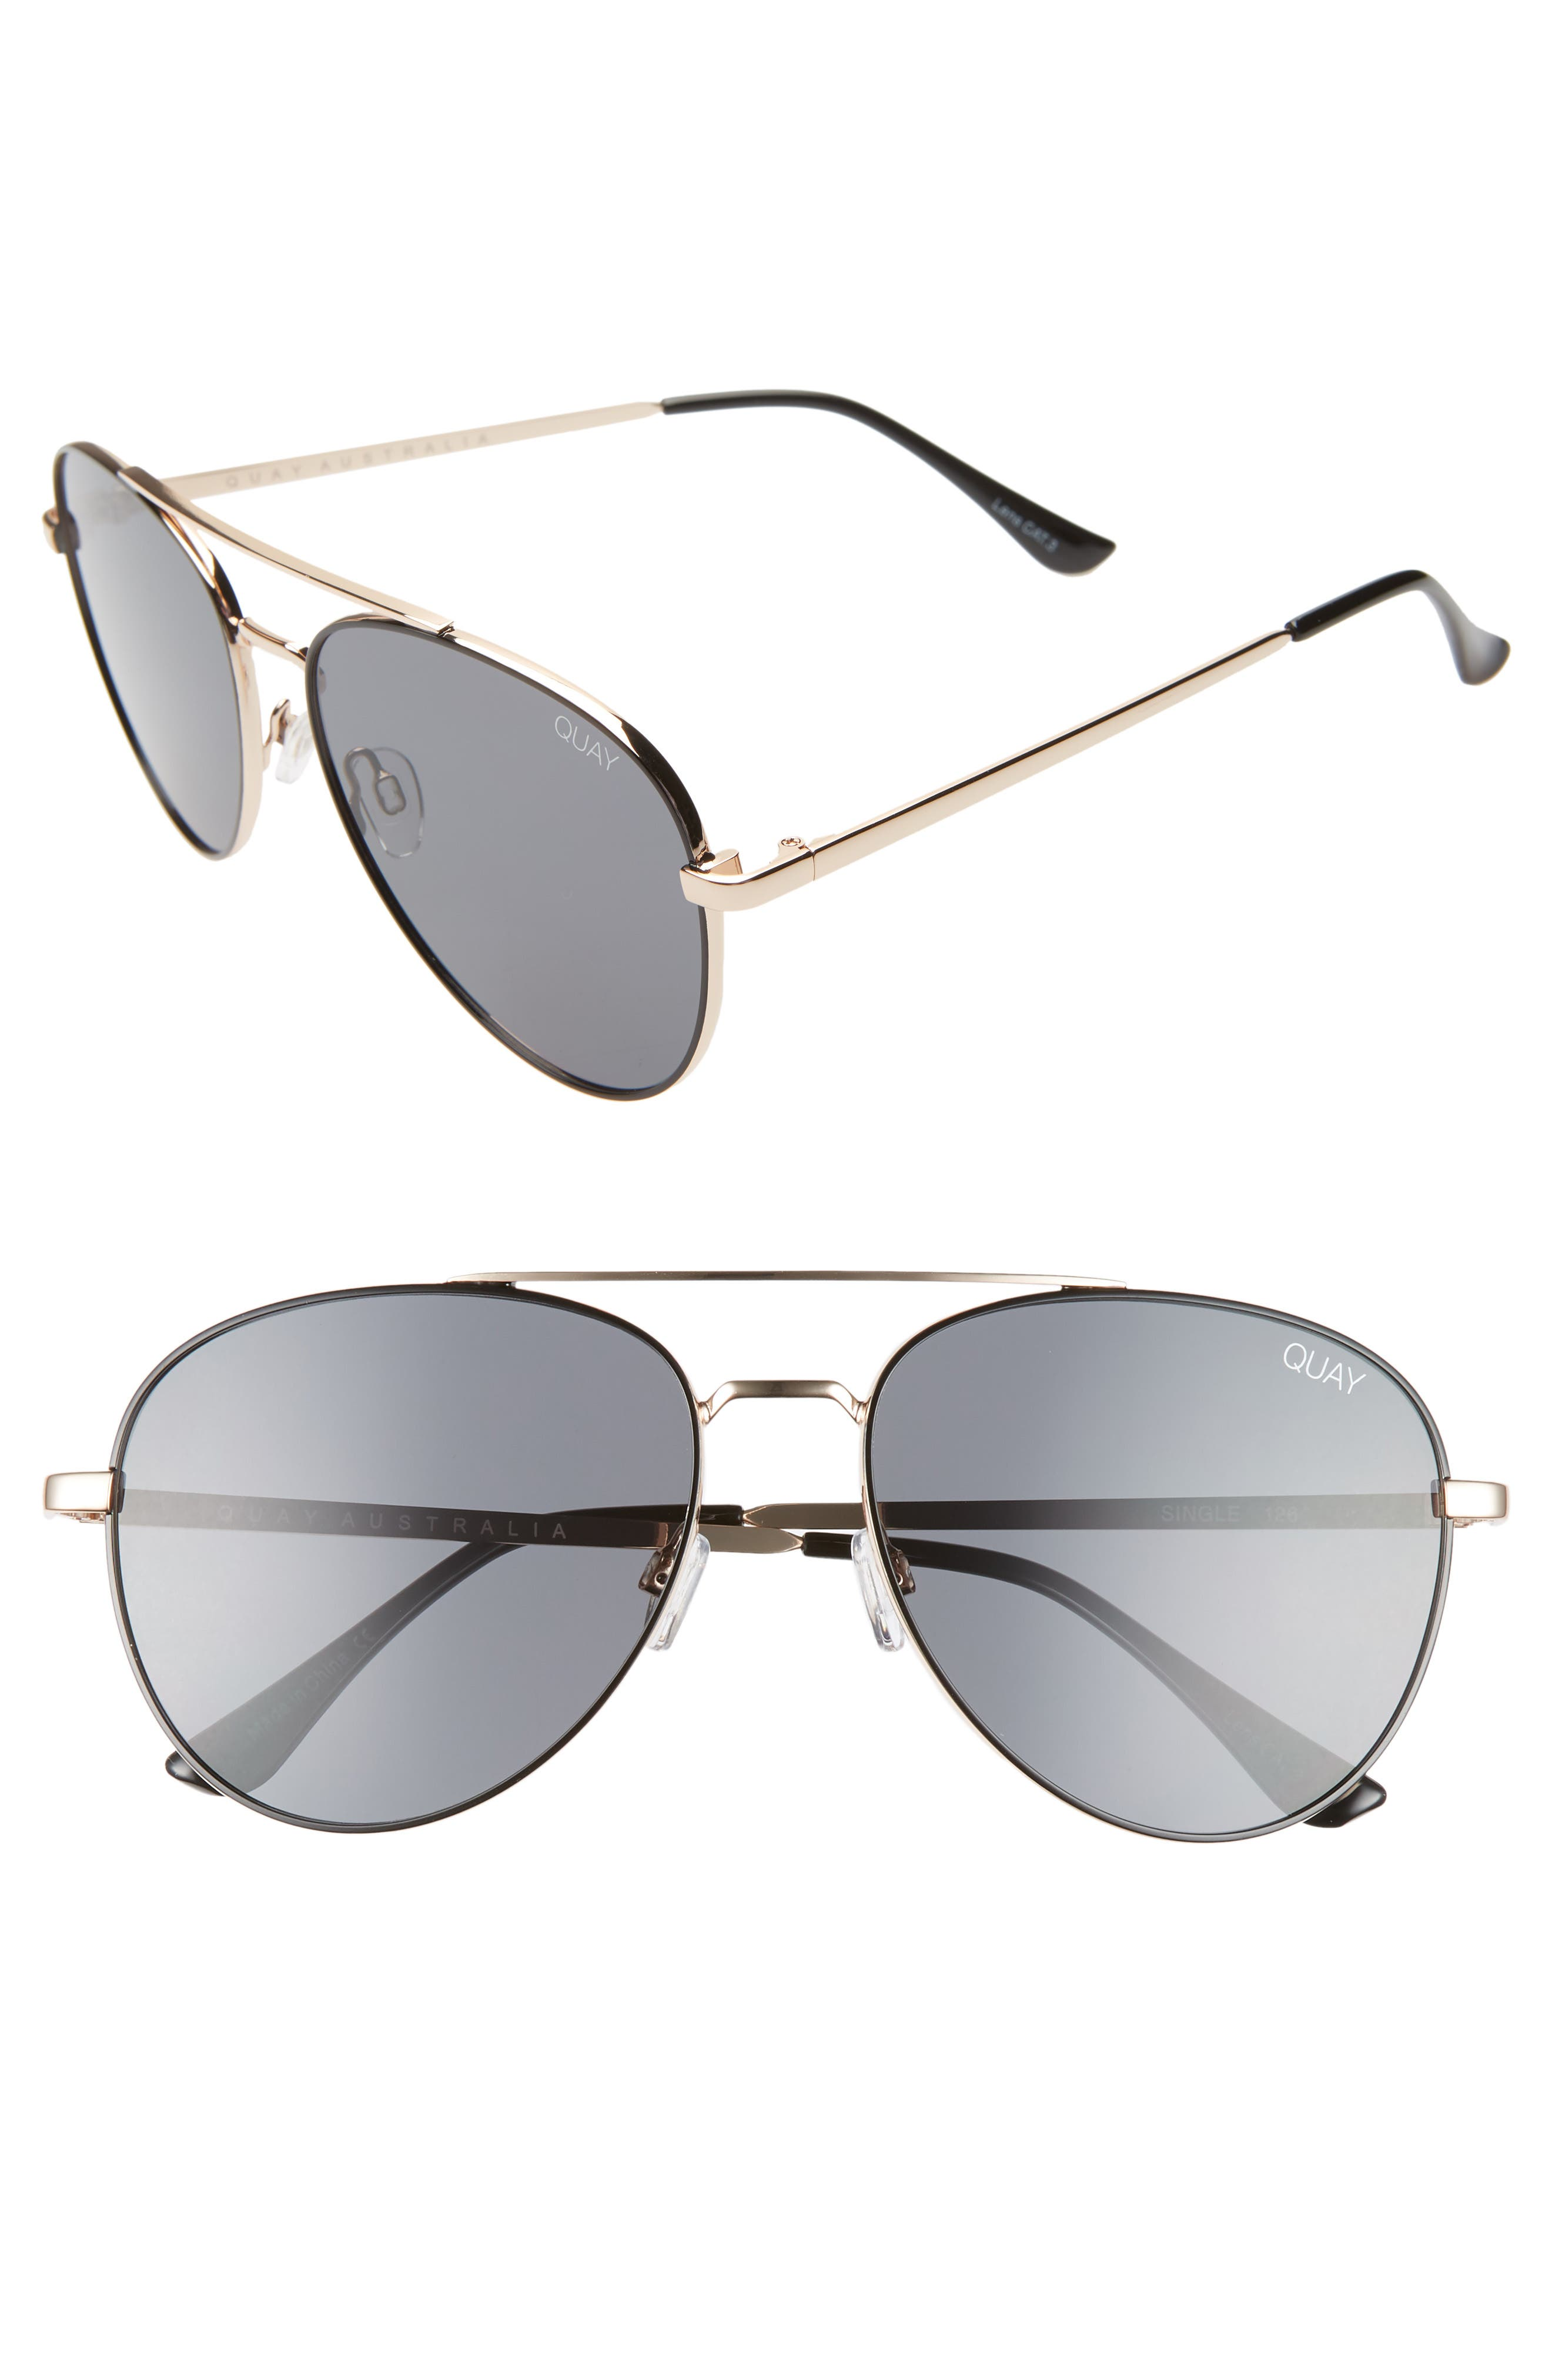 Quay Australia Single 50Mm Aviator Sunglasses - Gold/ Smoke